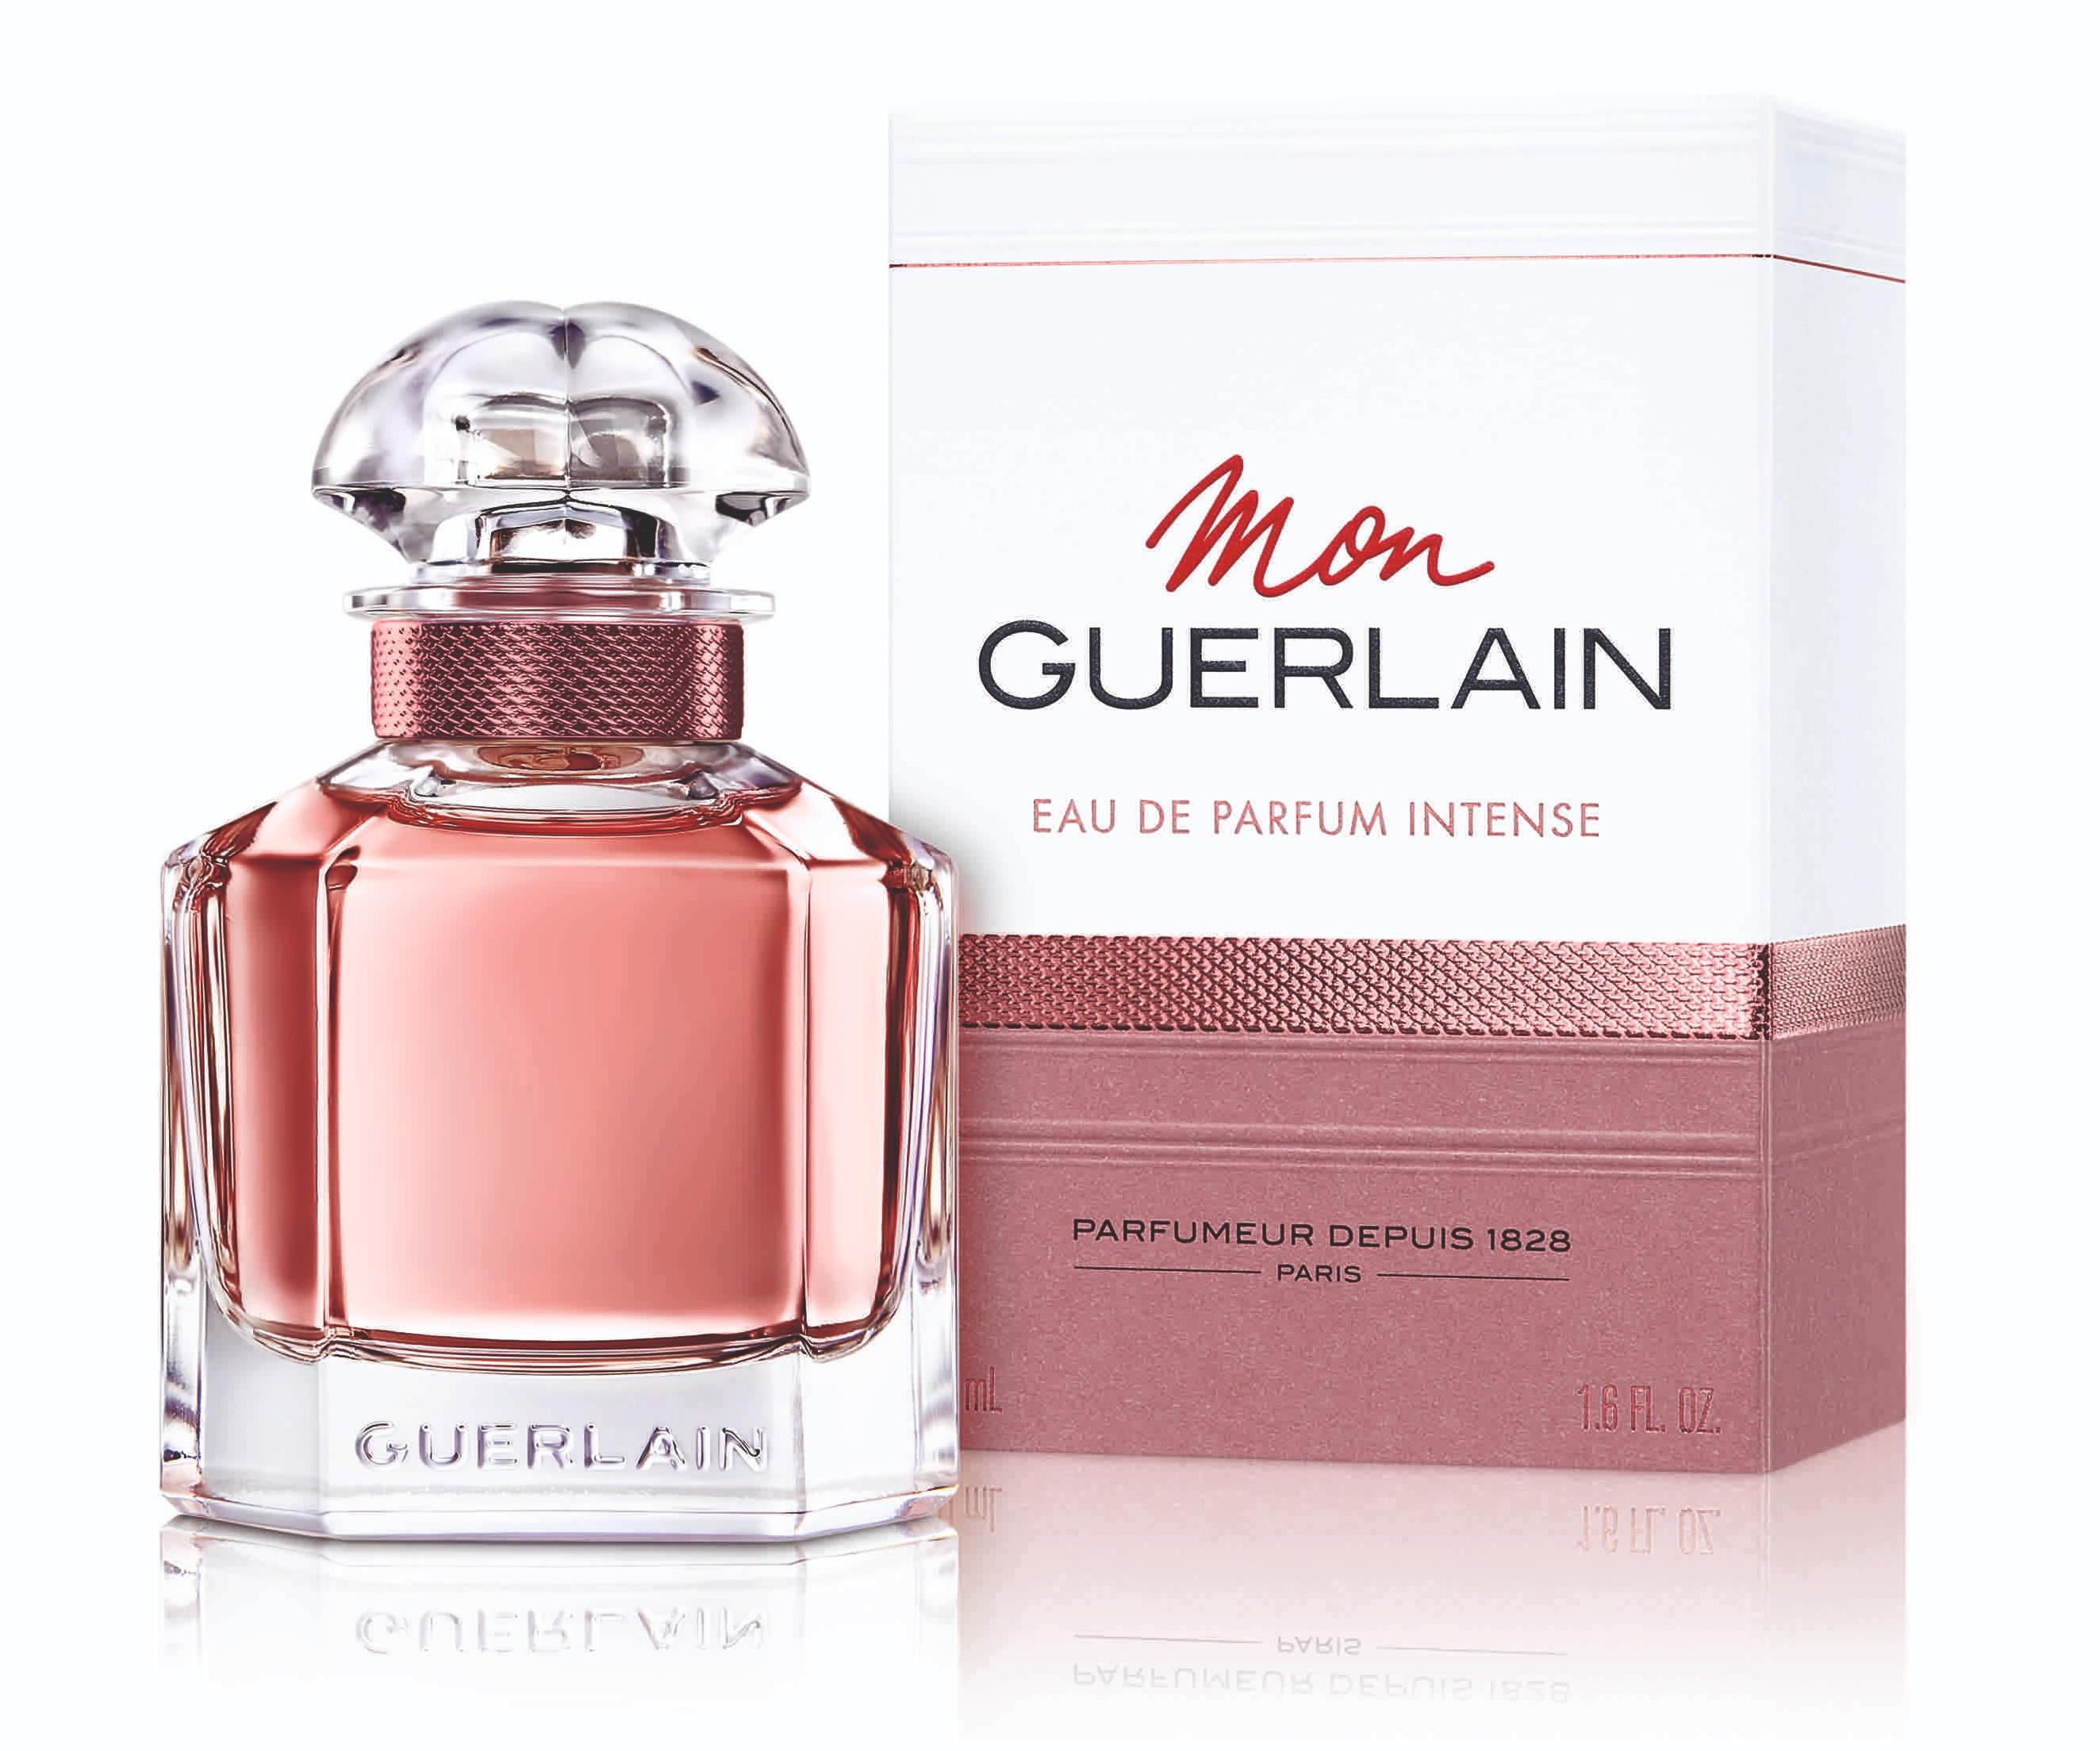 Guerlain-Mon-Guerlain-Eau-De-Parfum-Intense-Box-Flacon.jpg